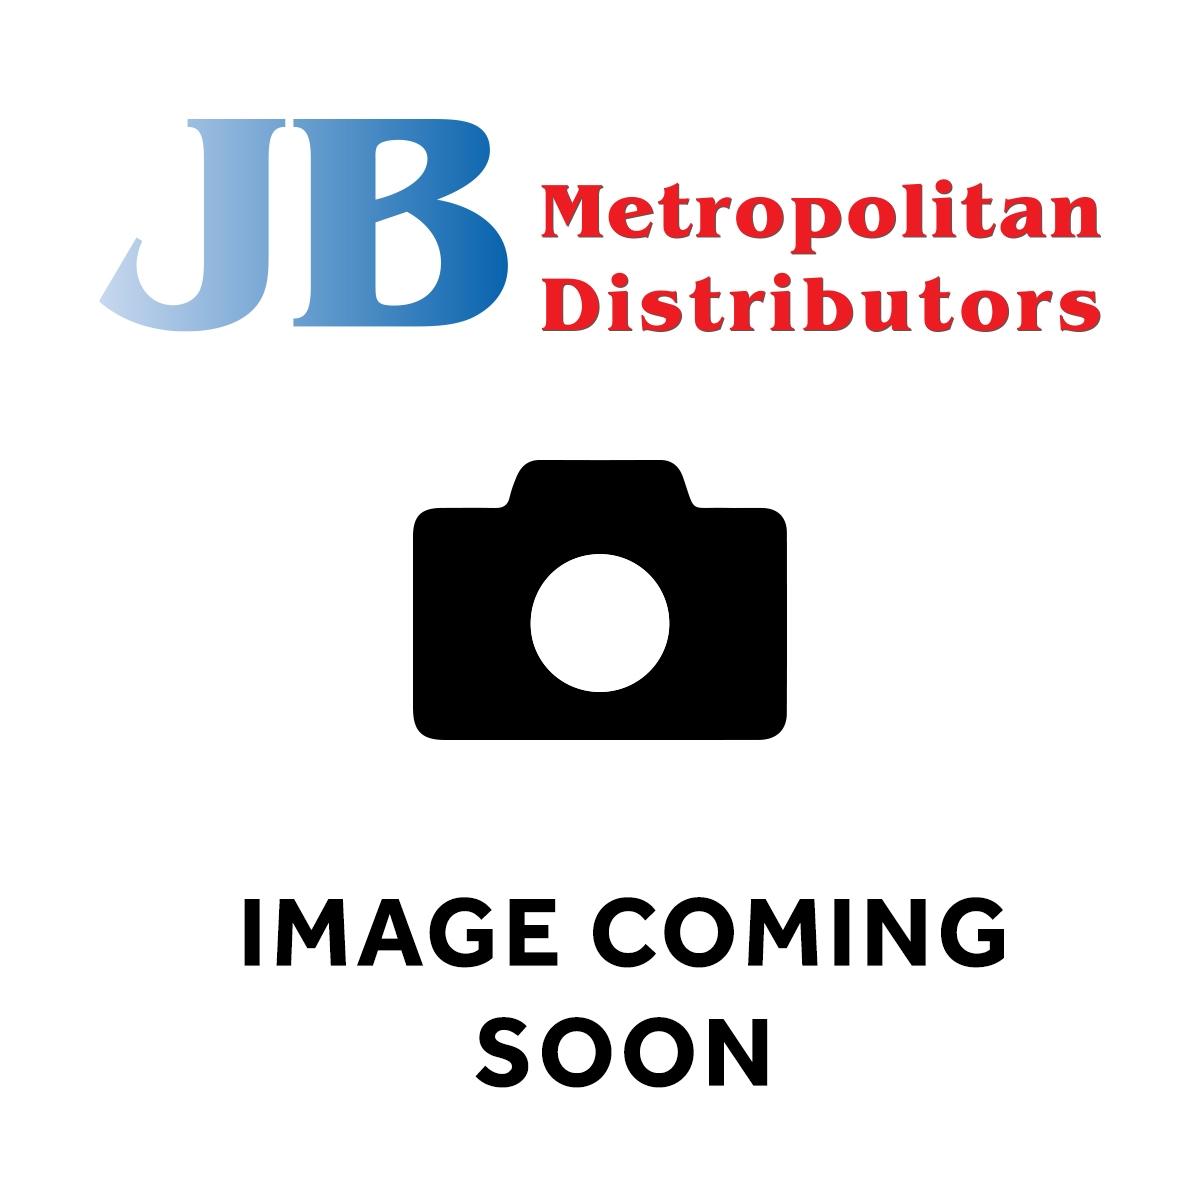 45G CARMAN'S ALMOND CASHEW & CRANBERRY NUT BAR